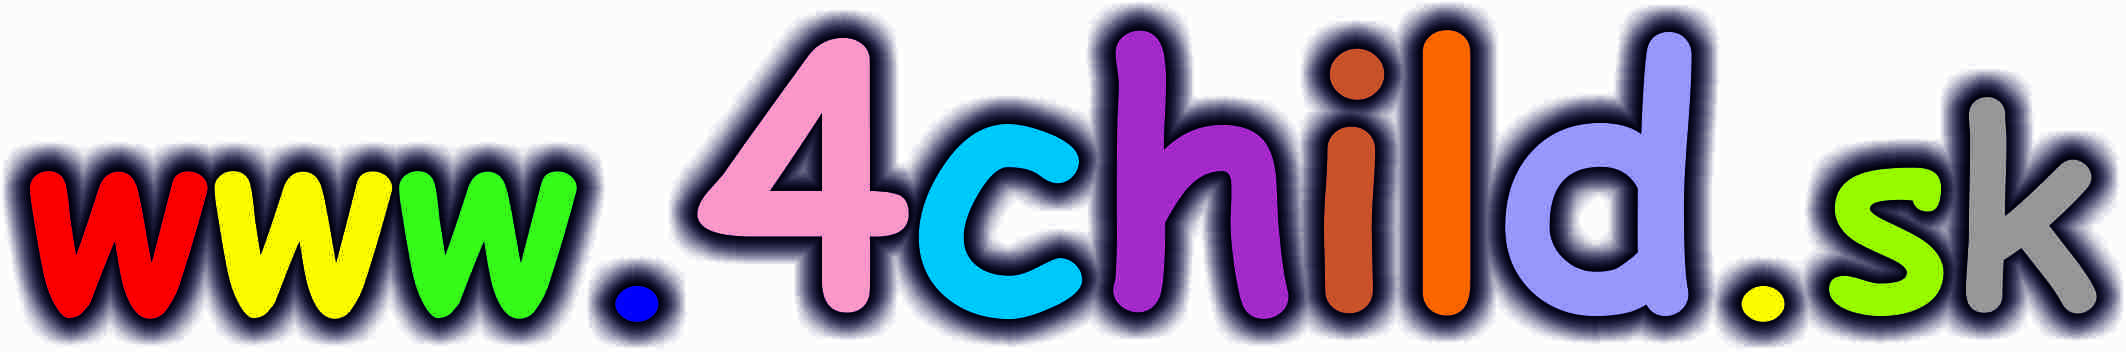 www.4child.sk